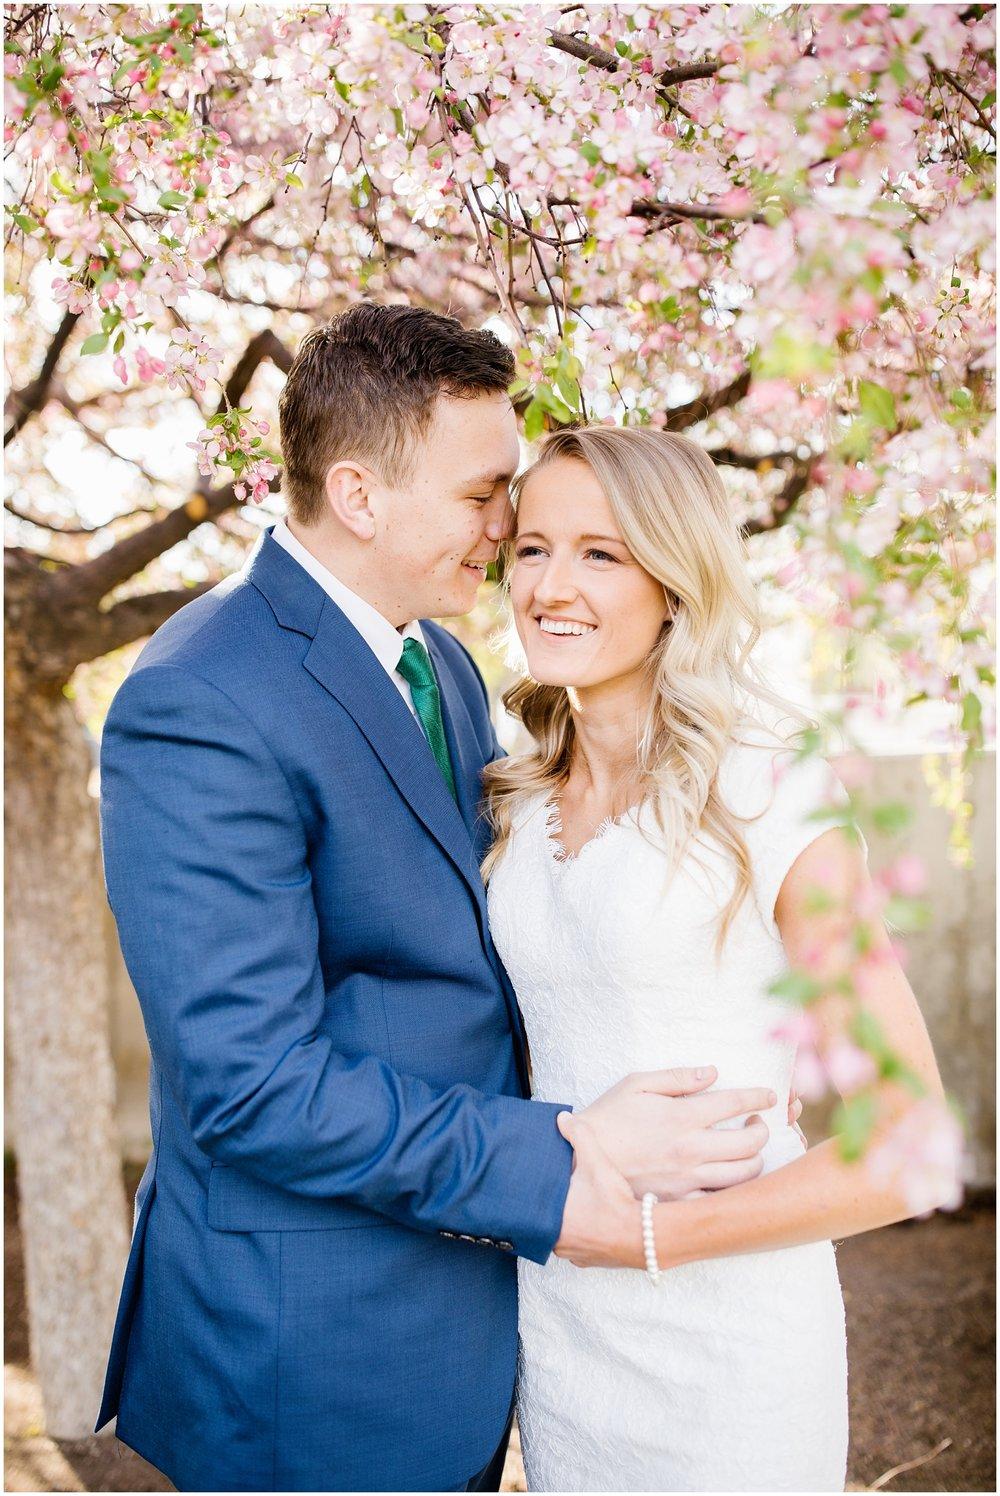 TA-Bridals-2_Lizzie-B-Imagery-Utah-Wedding-Photographer-Park-City-Salt-Lake-City-Thanksgiving-Point-Ashton-Gardens-Lehi-Utah.jpg